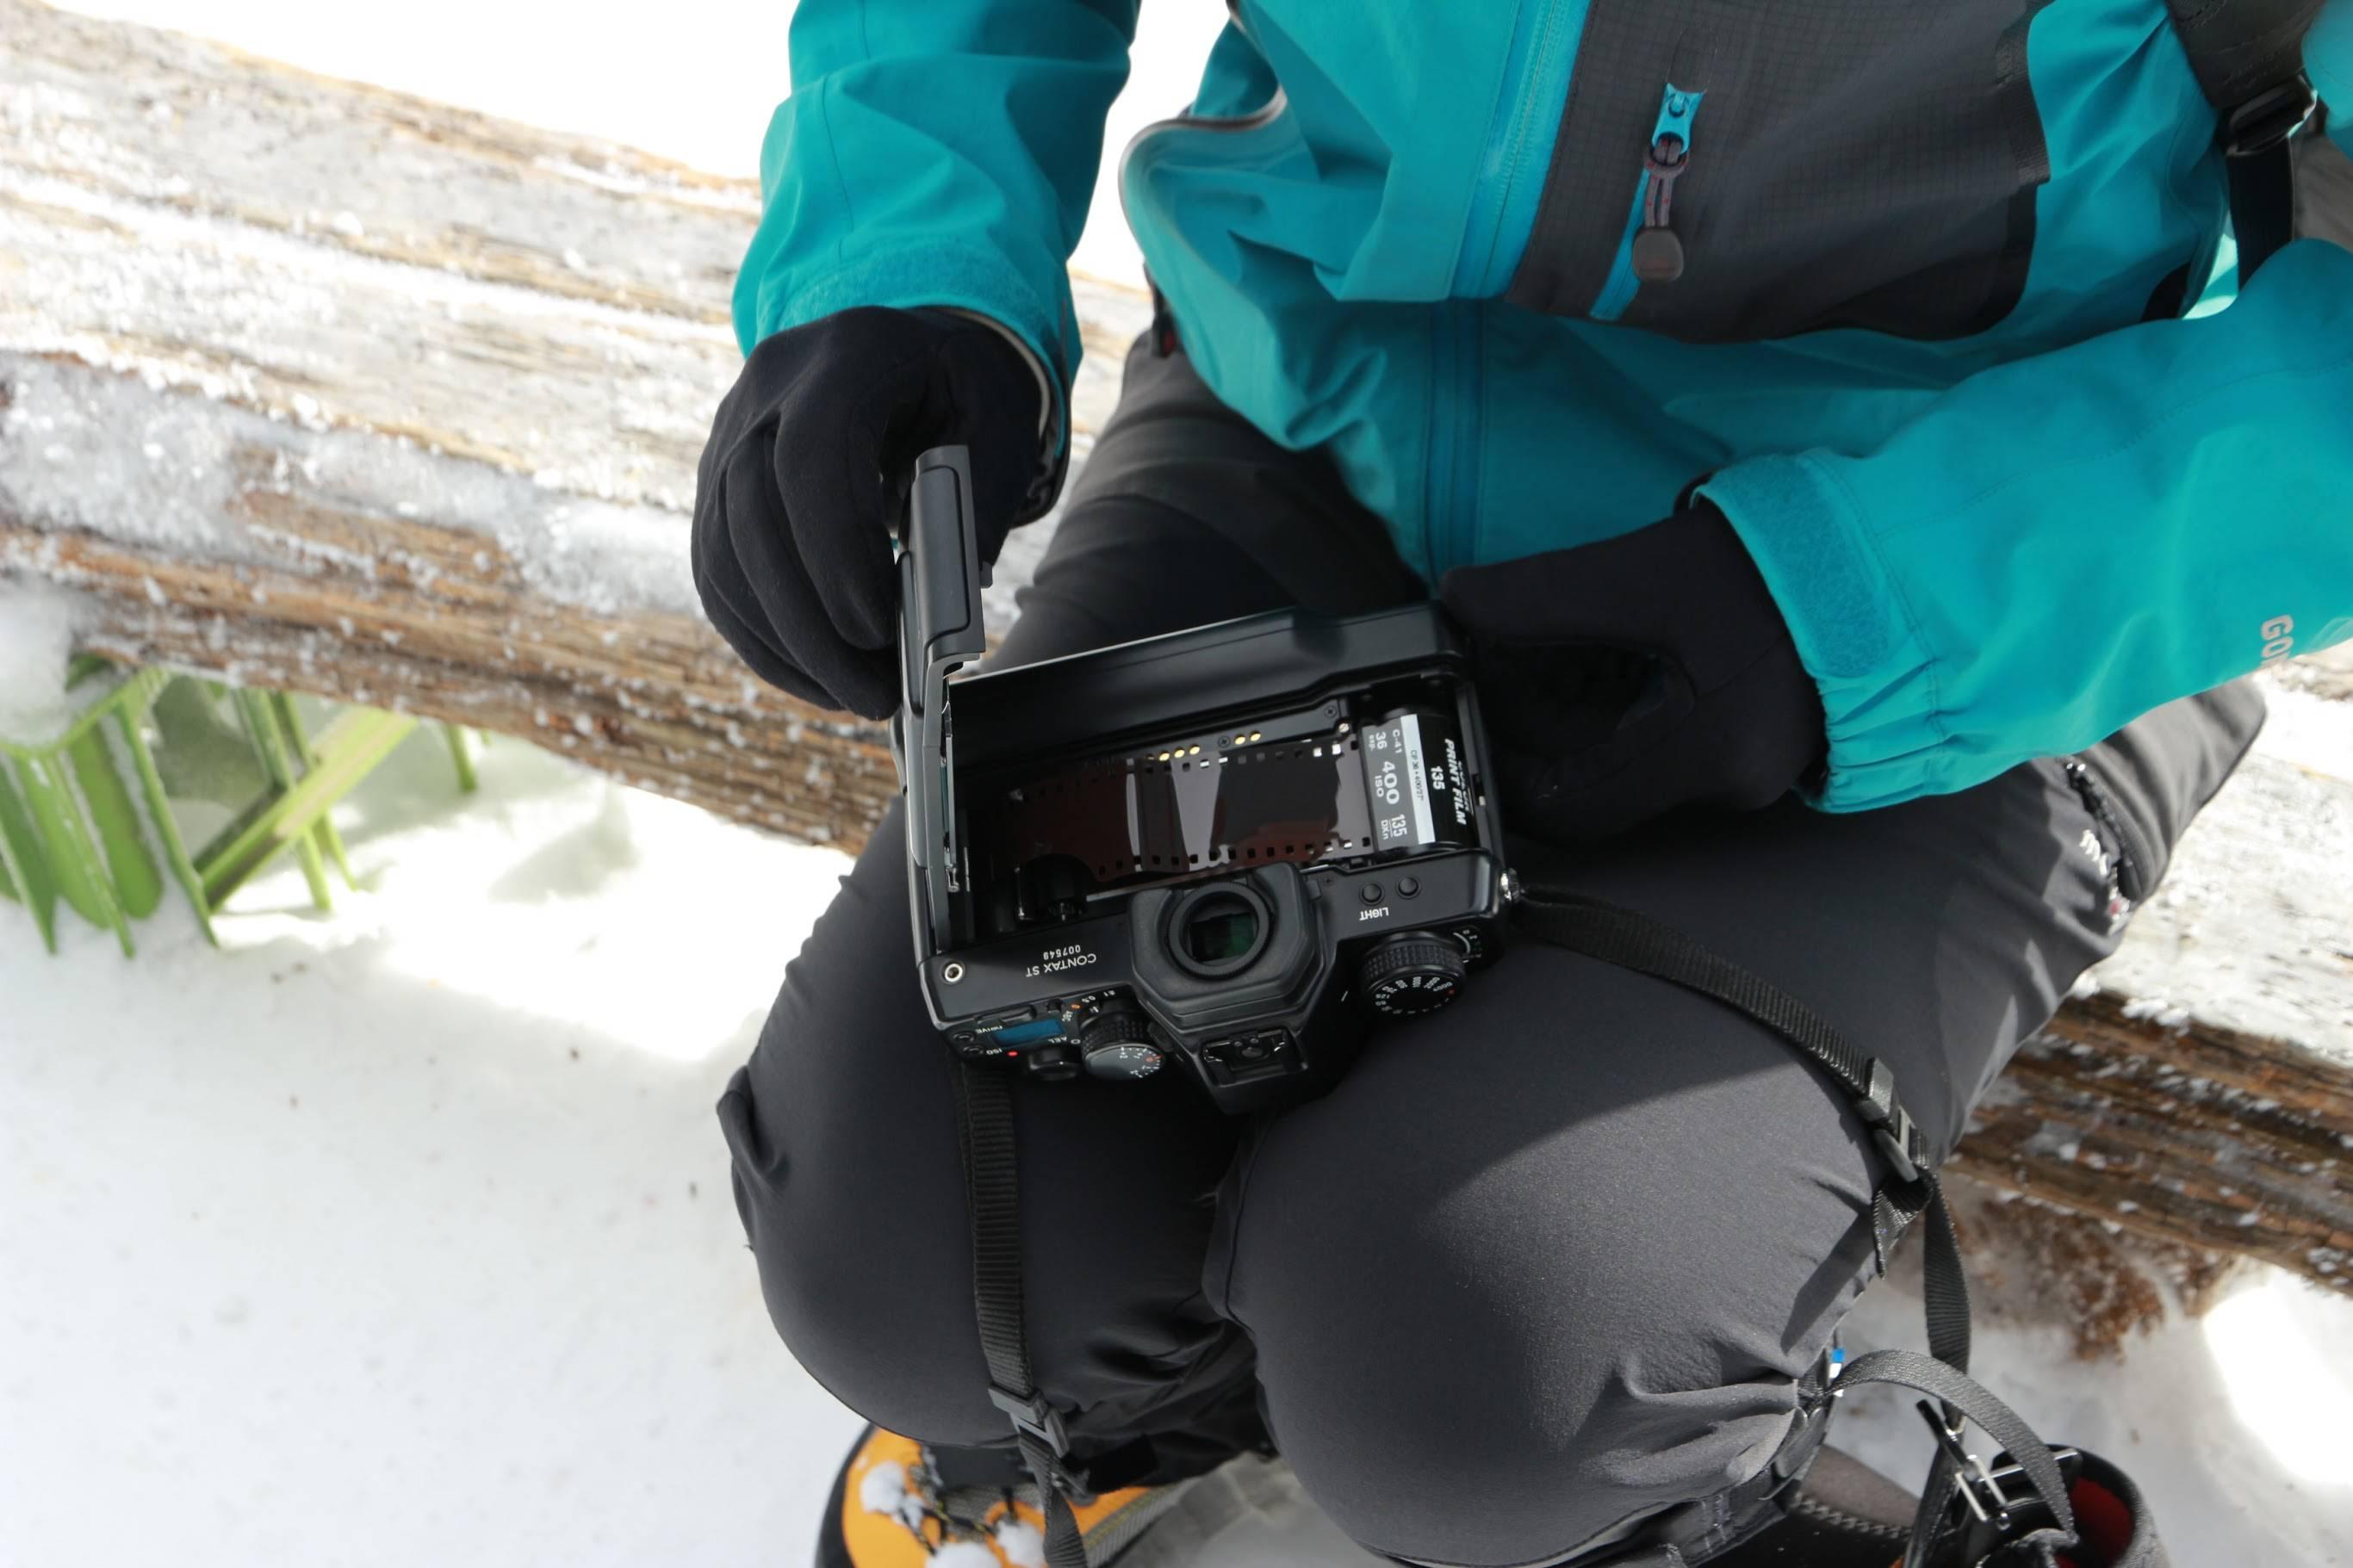 MOUNTAIN COLLECTOR 鈴木さんに学ぶ山写真のコツ